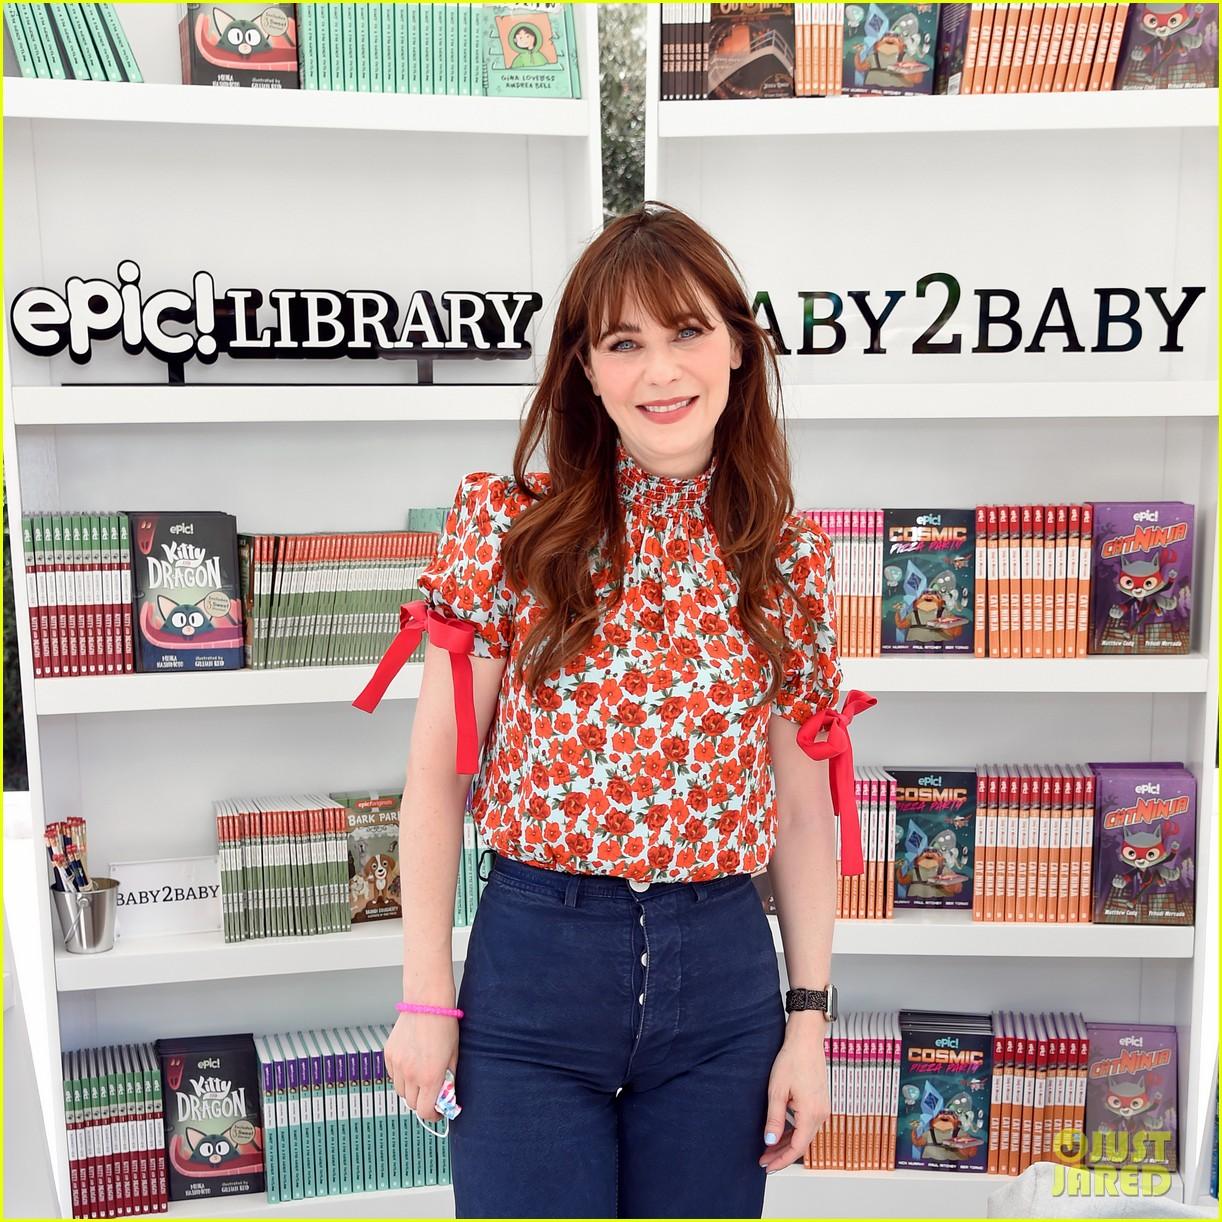 katy perry zooey deschanel nicole richie baby2baby event 254593103